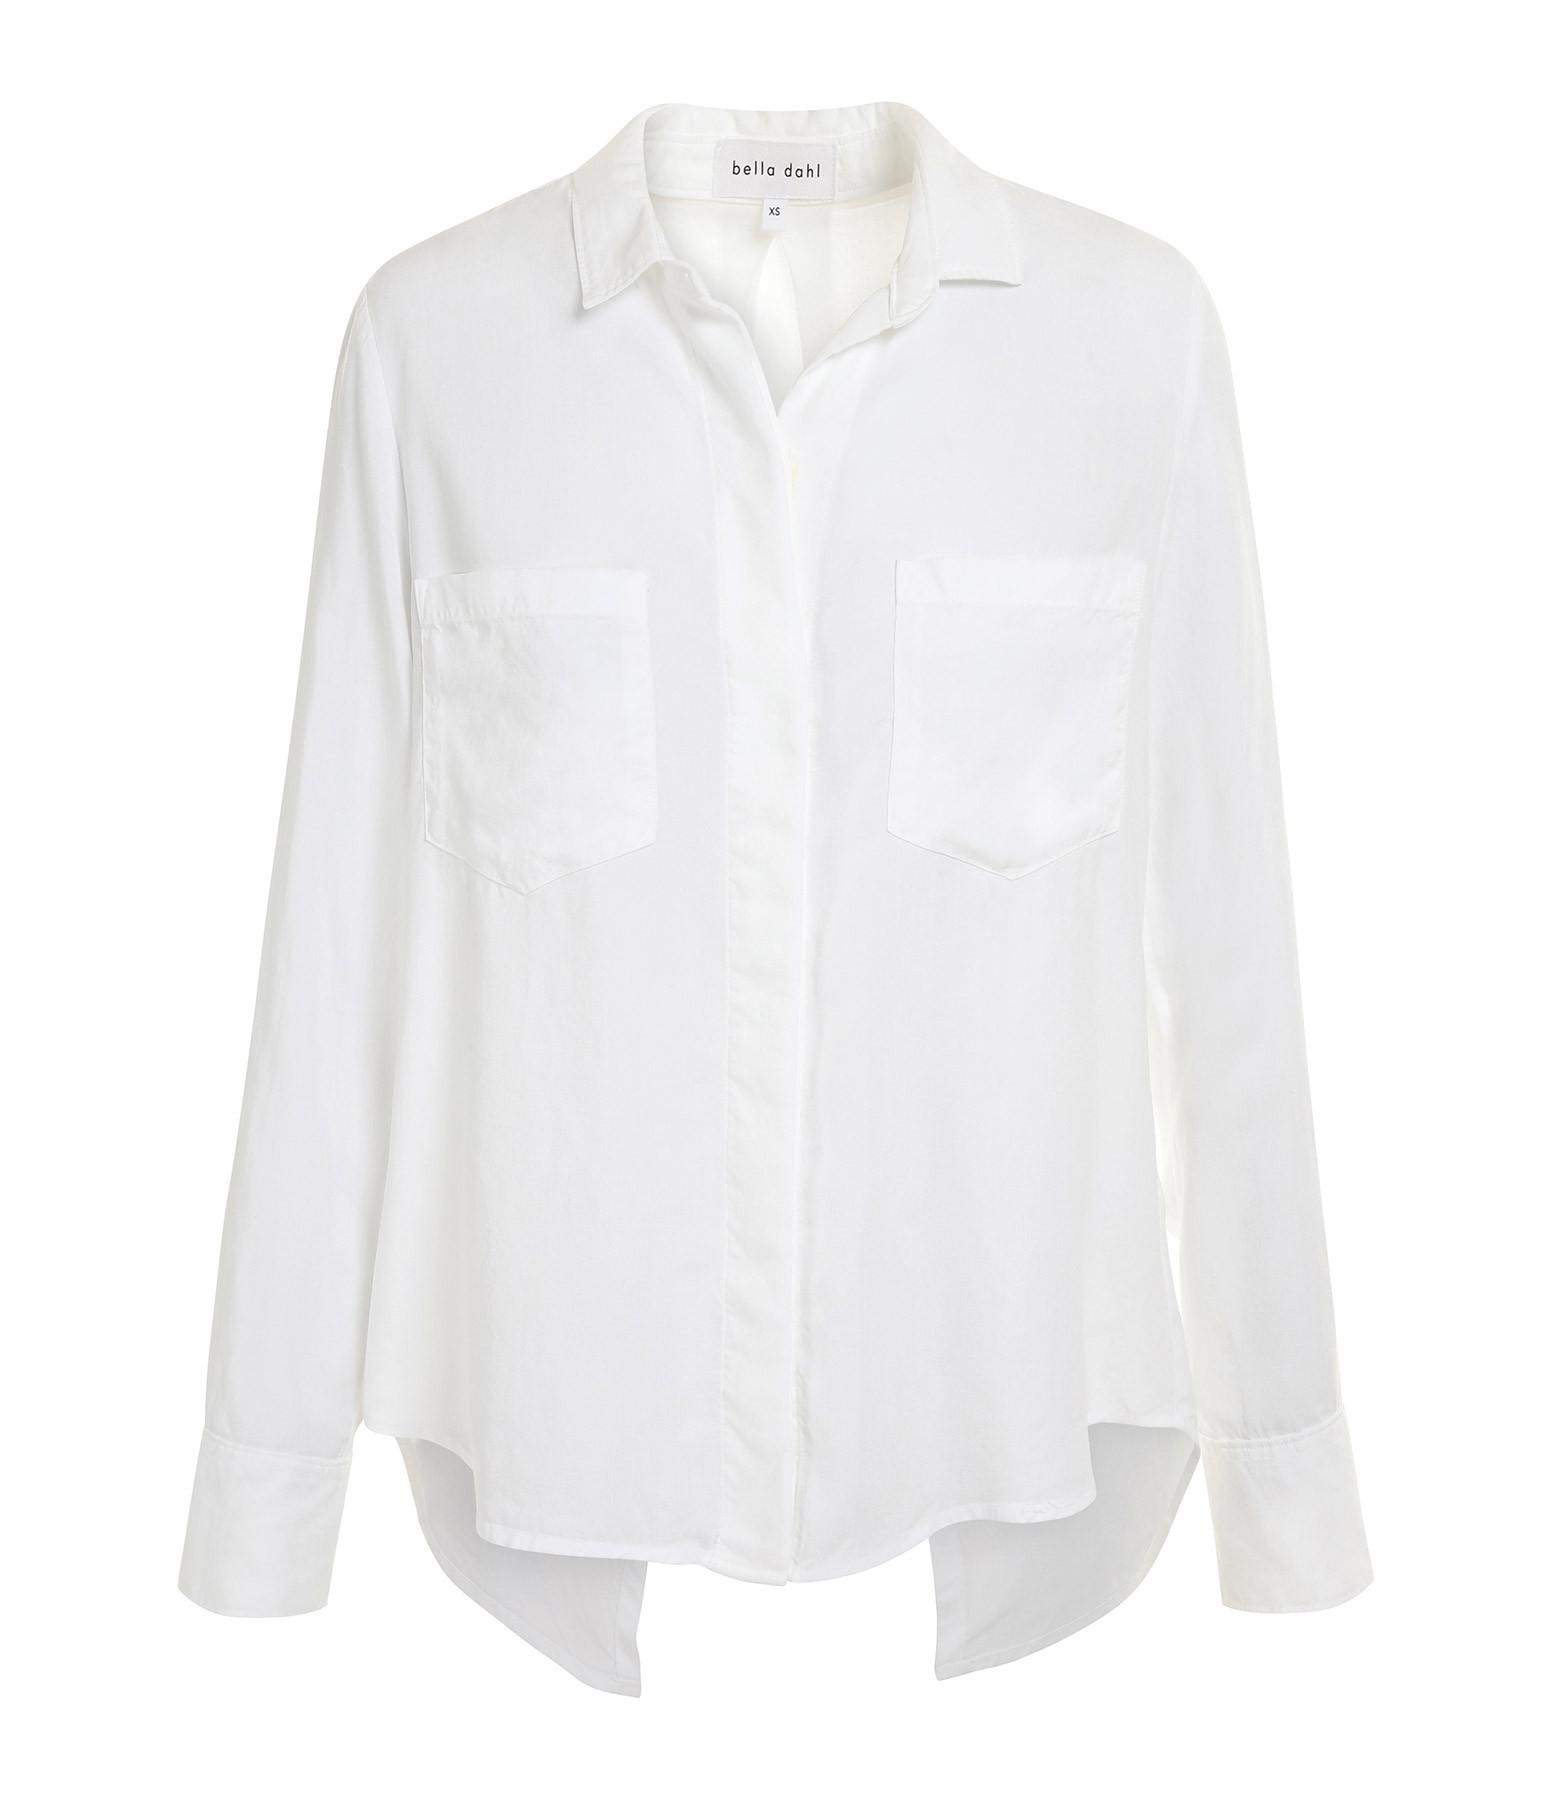 BELLA DAHL - Chemise Split Back Button Down Blanc